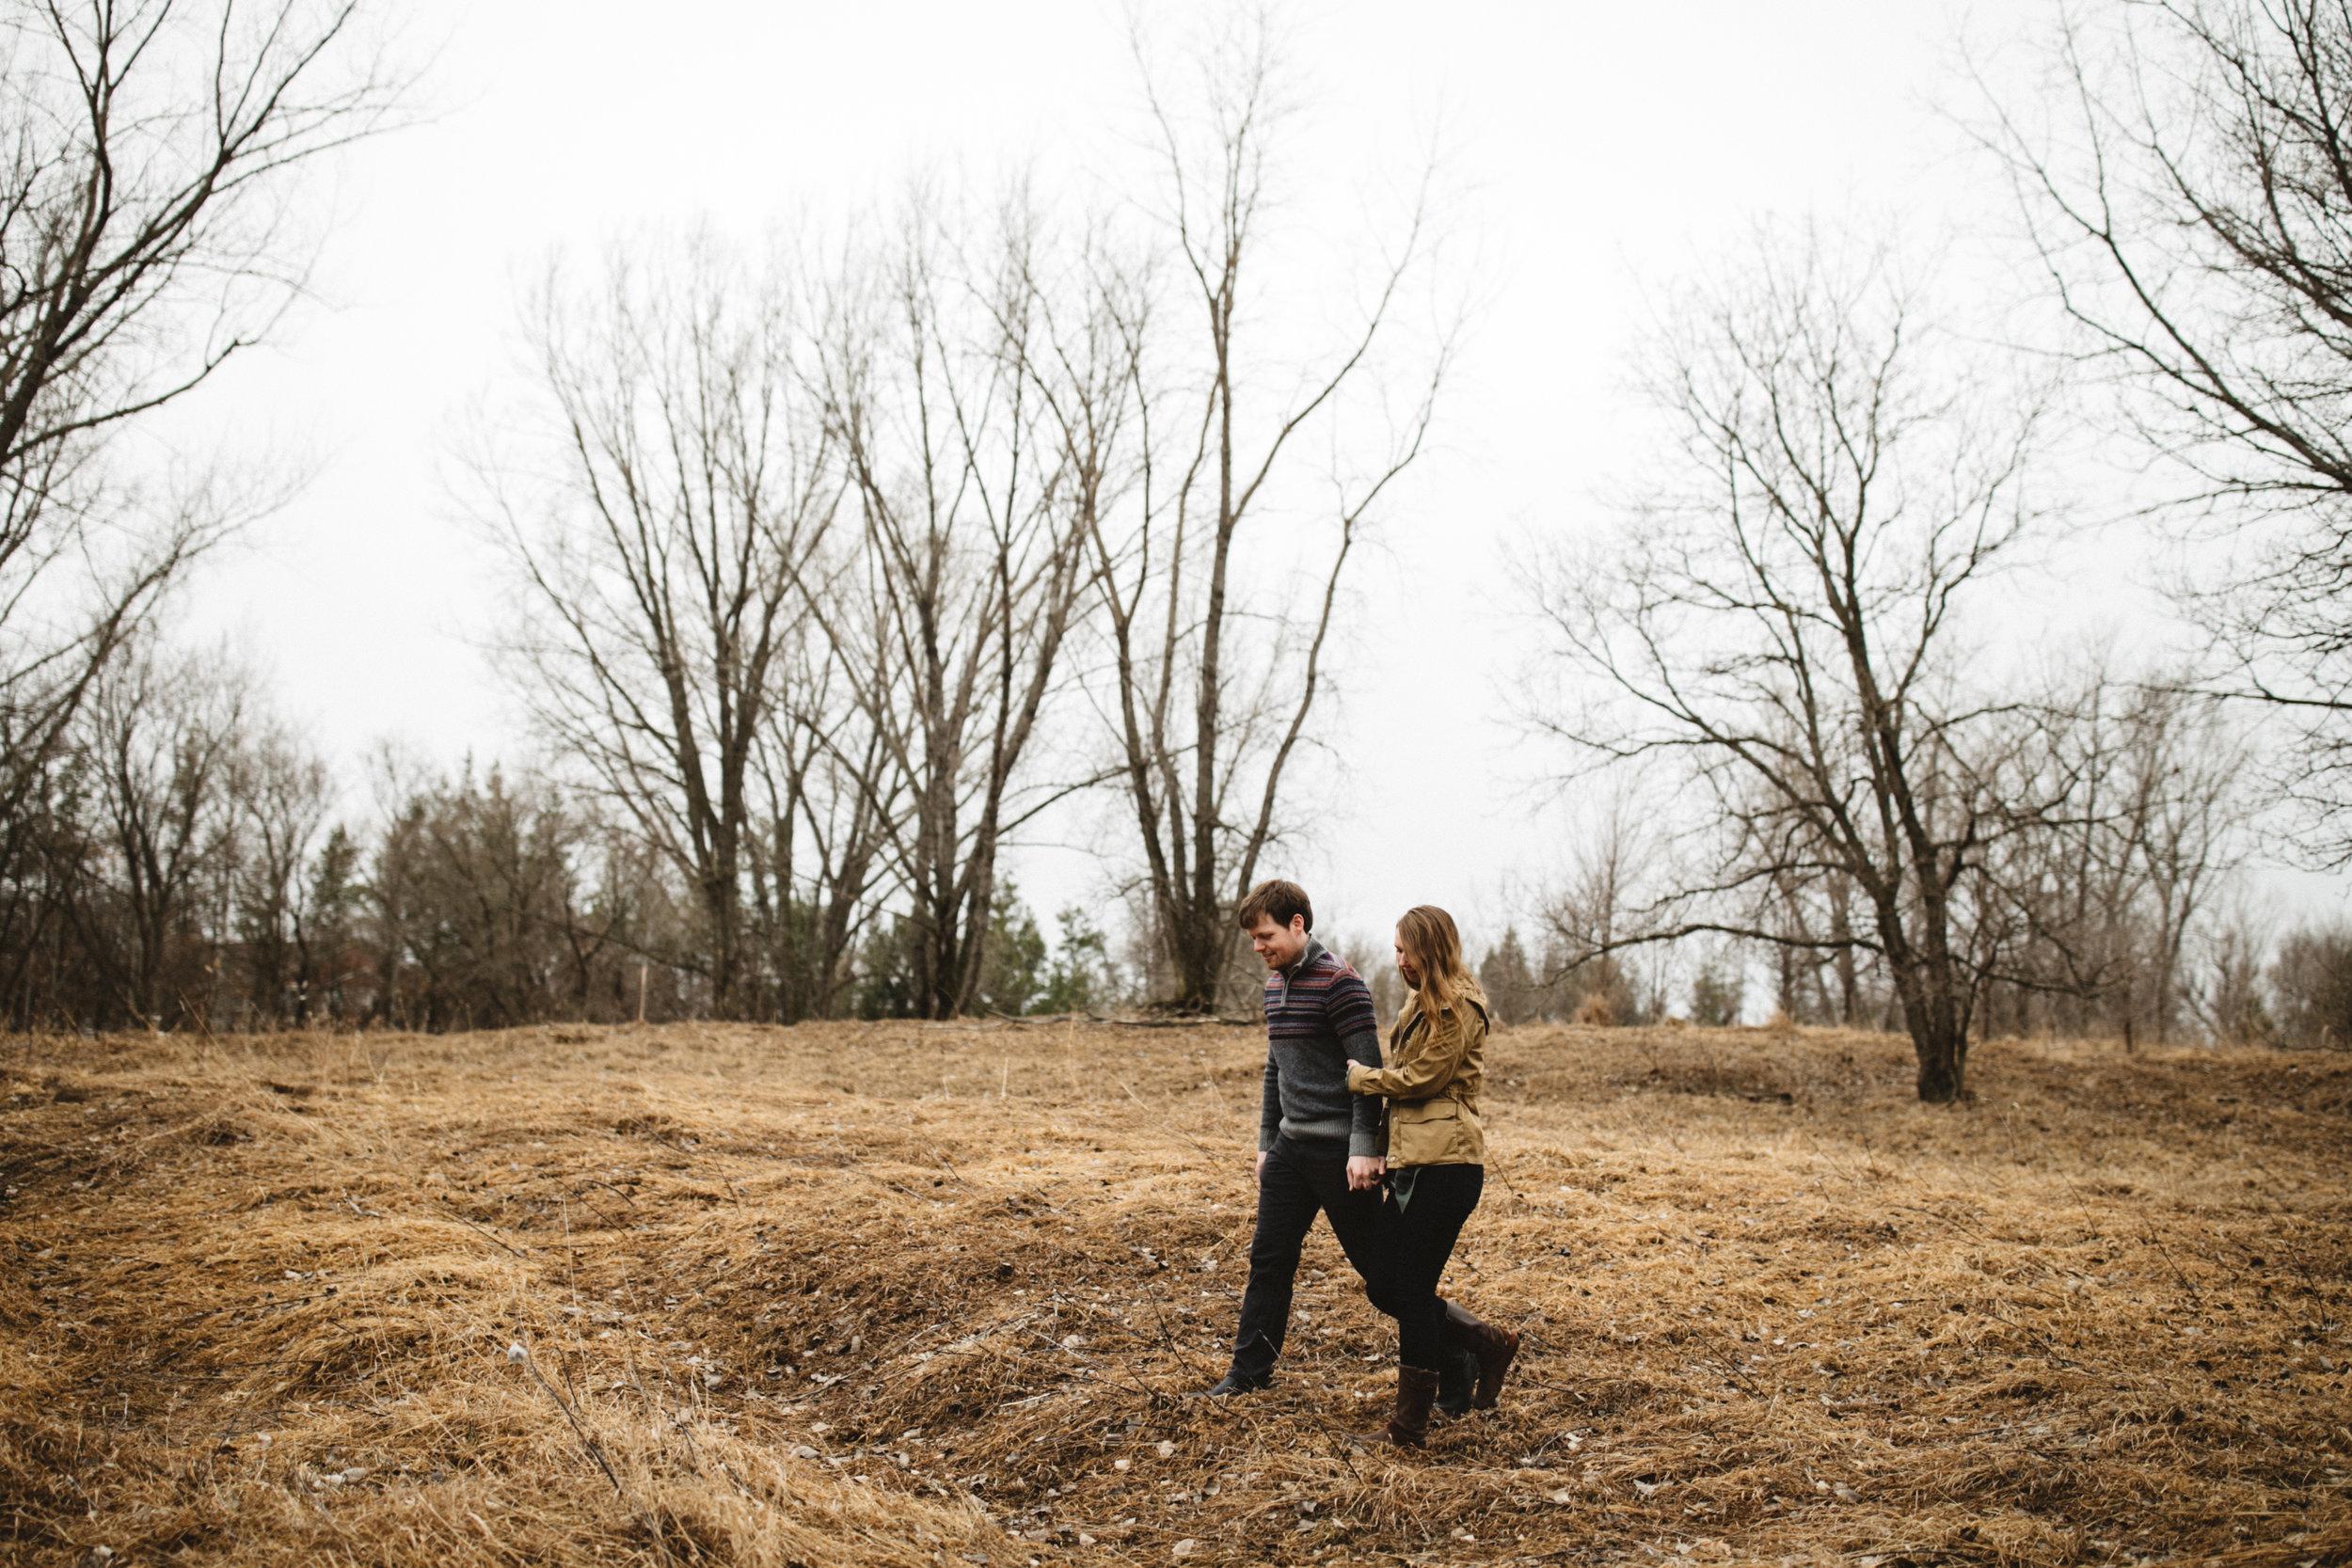 Photojournalistic engagement photography at the Northland Arboretum in Brainerd Minnesota by Britt DeZeeuw